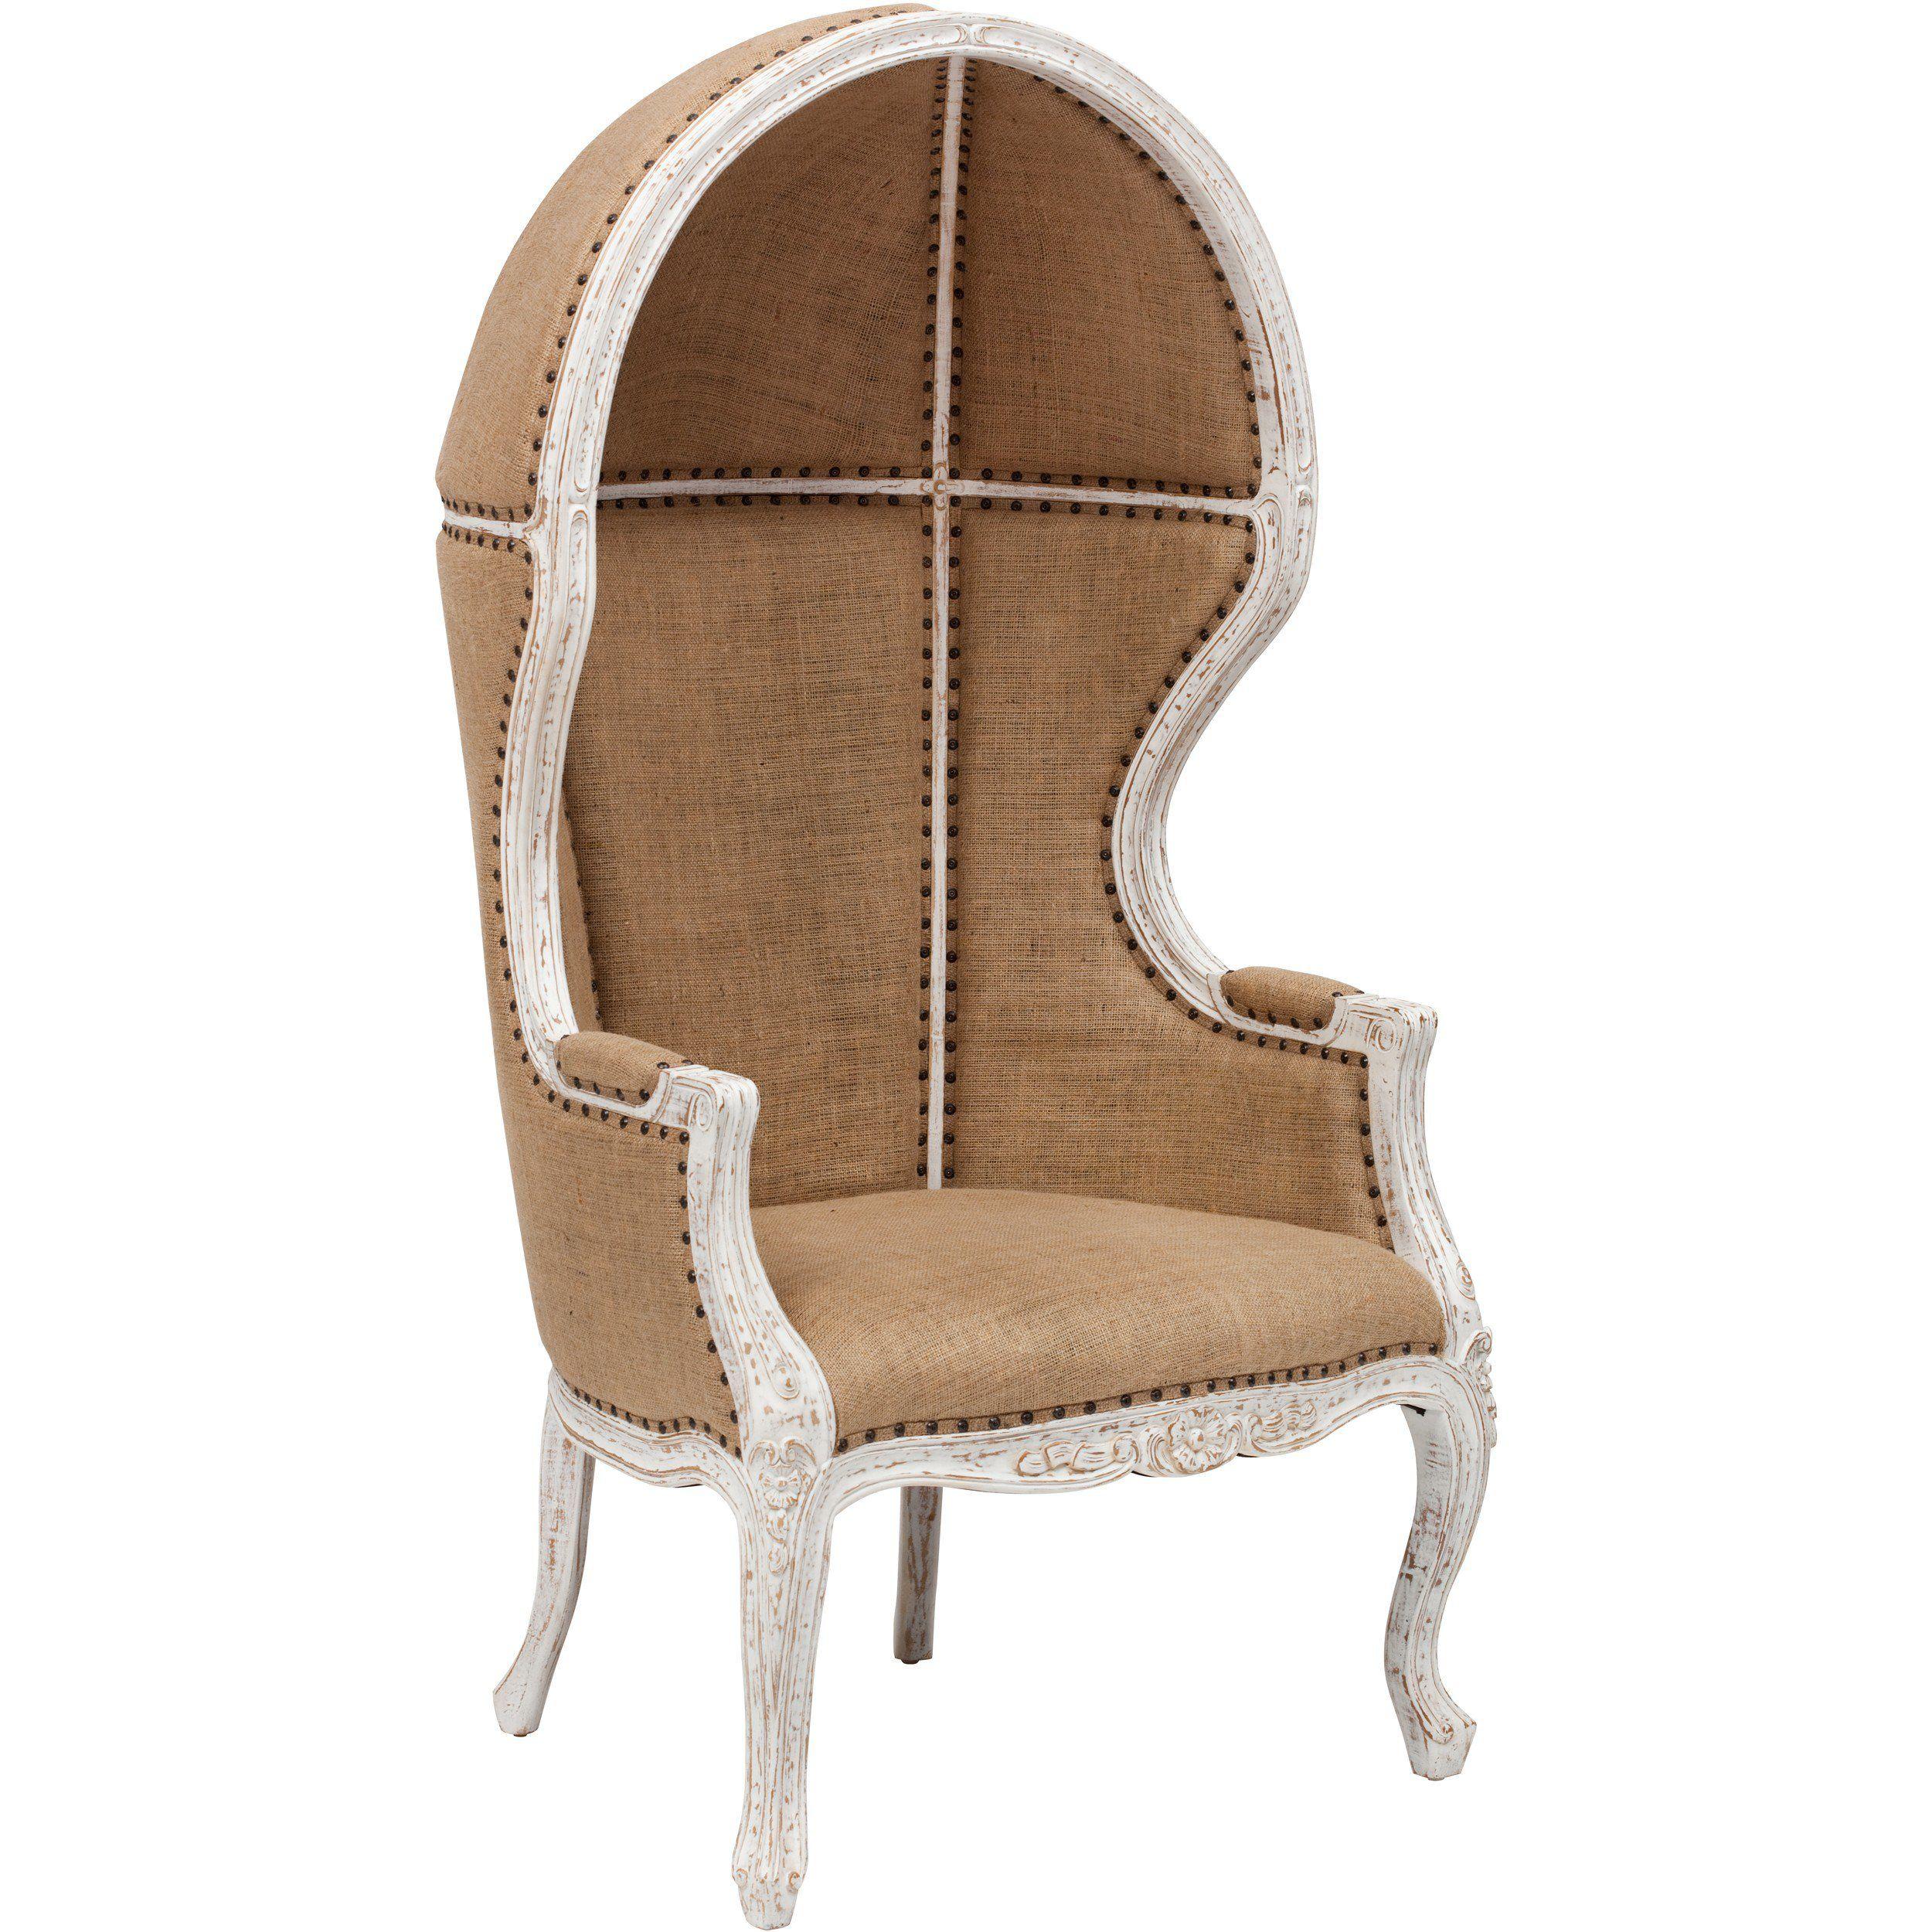 Dome Chair Burlap